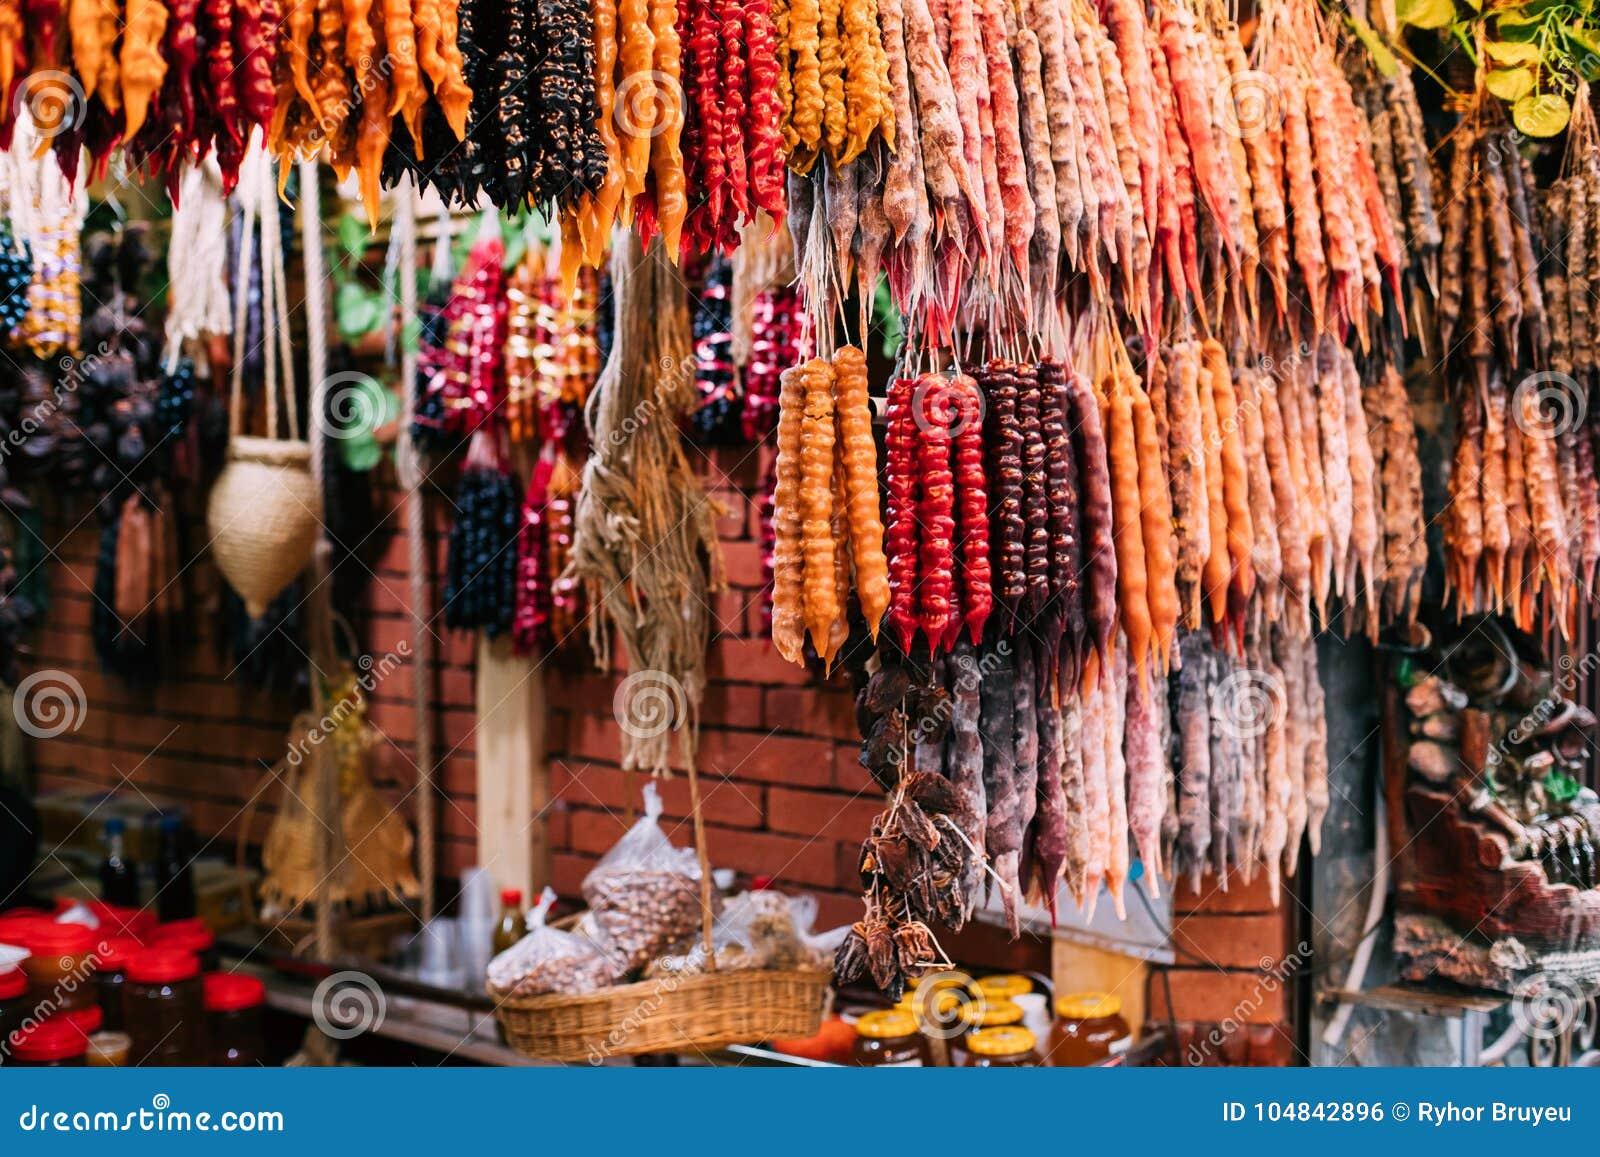 Churchkhela variopinto è Candy a forma di salsiccia georgiano tradizionale